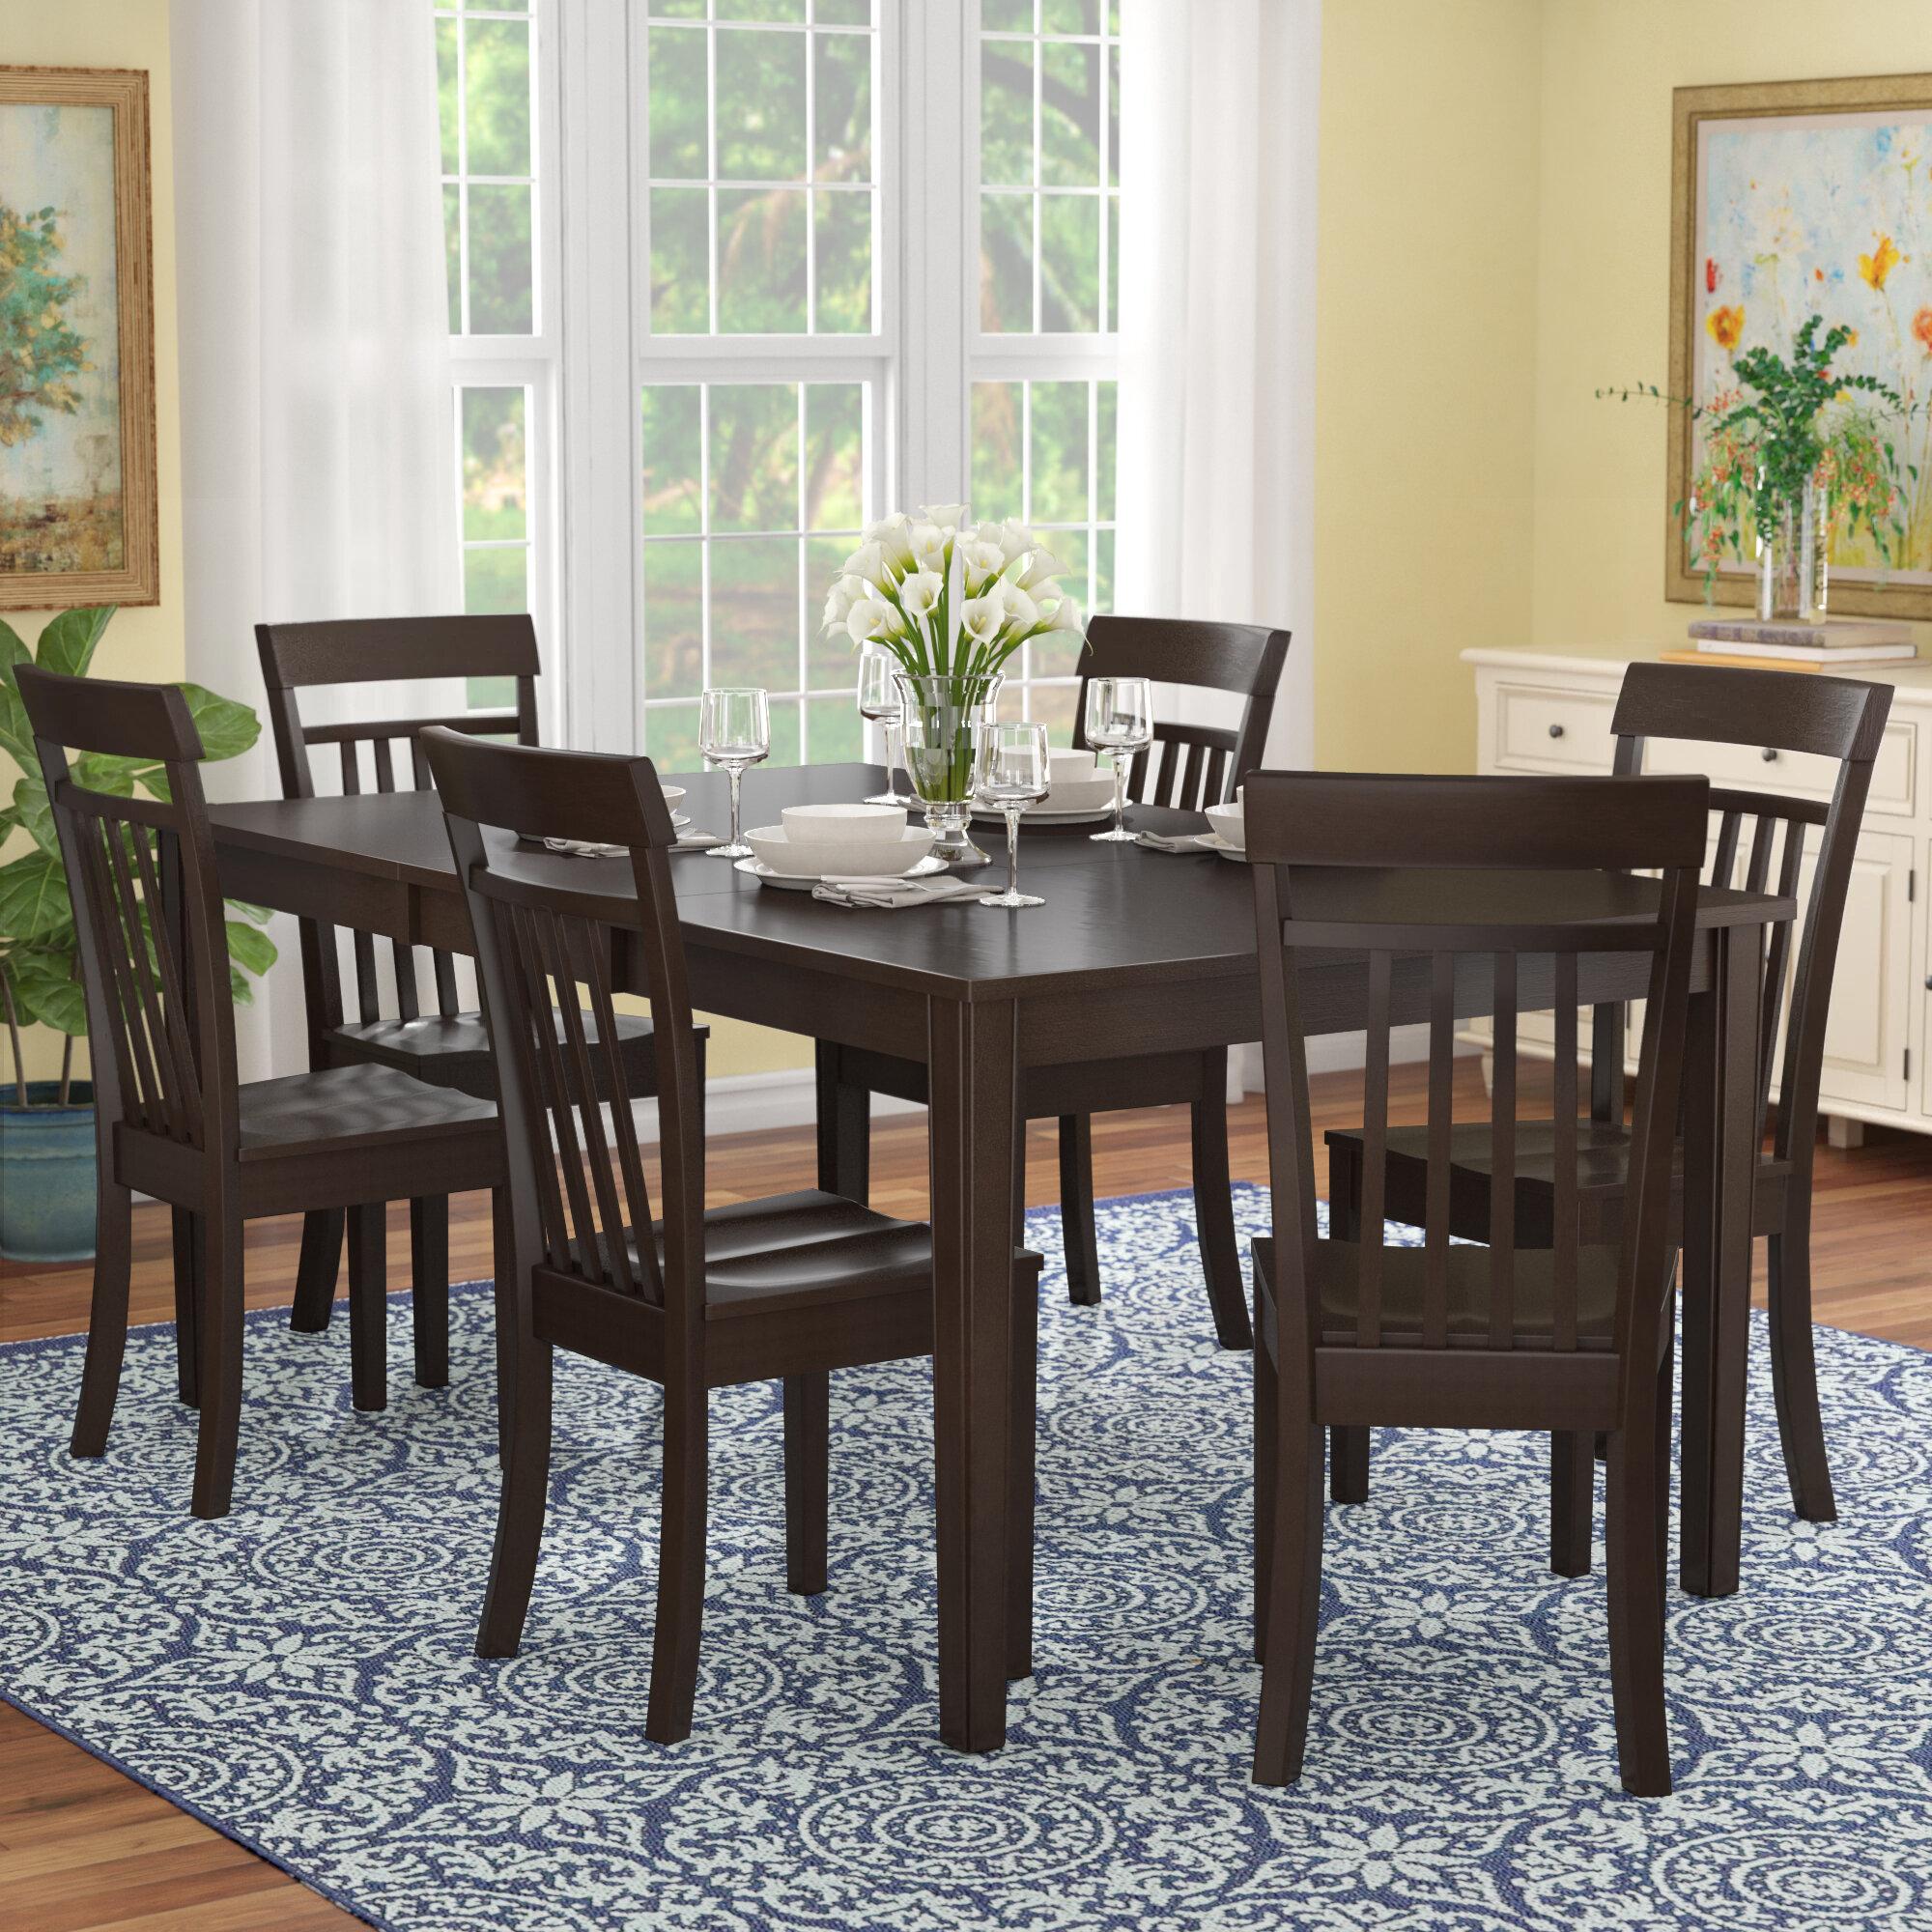 7 piece dining set with leaf contemporary red barrel studio lindstrom piece dining set reviews wayfair